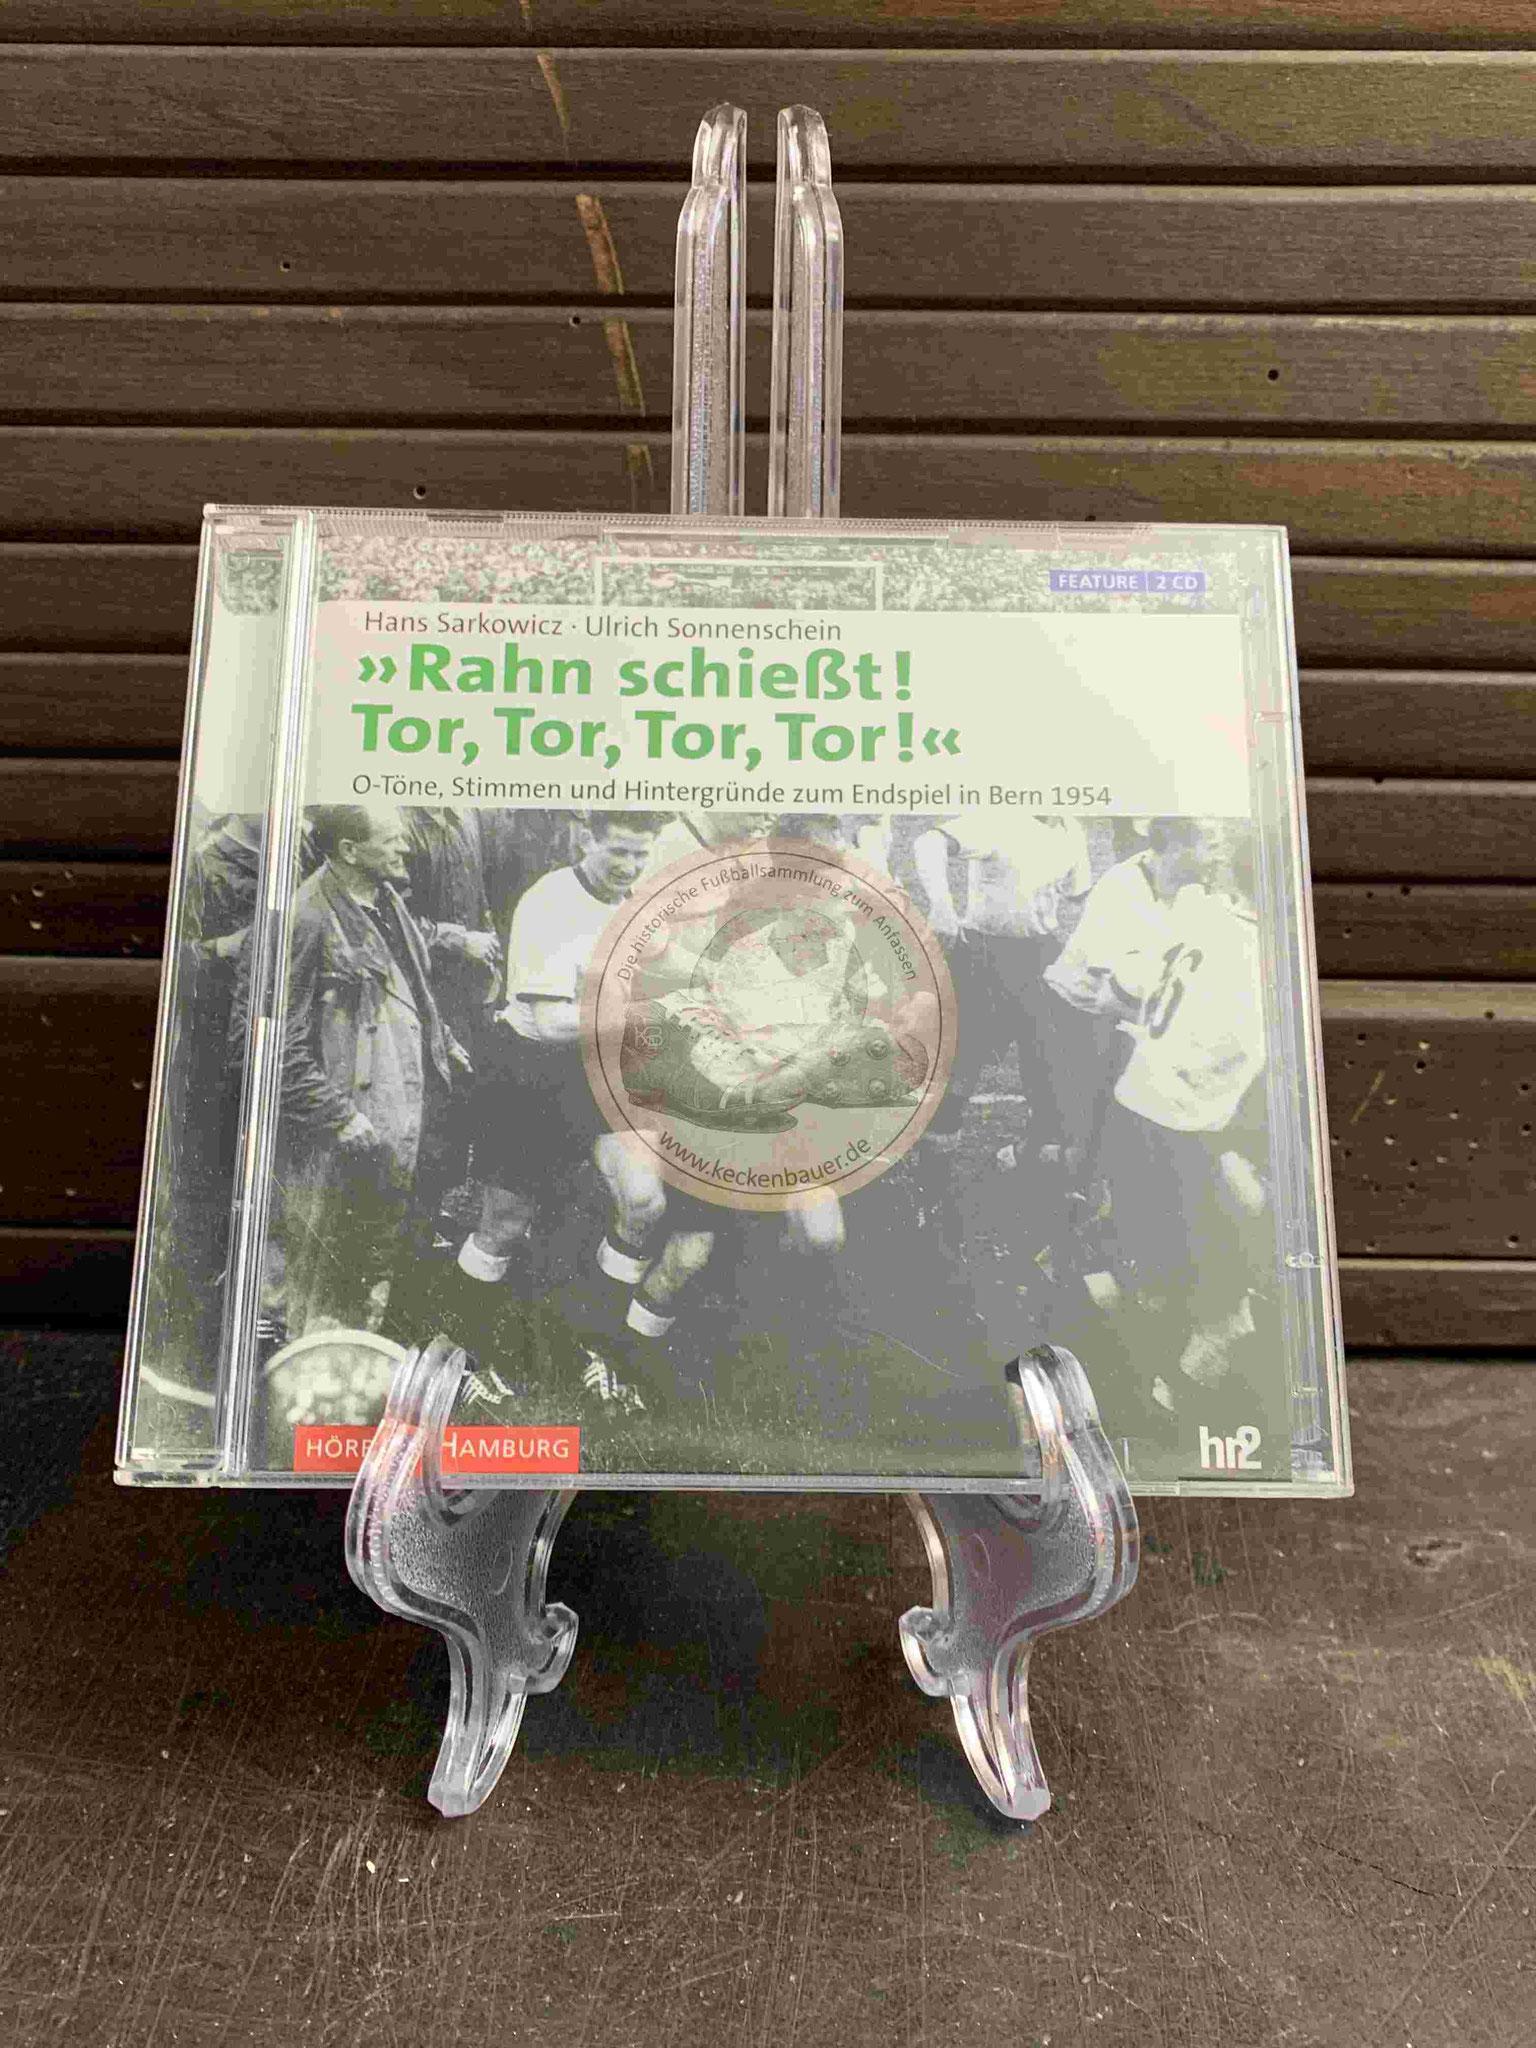 2004 Rahn schießt Tor,Tor,Tor,Tor!